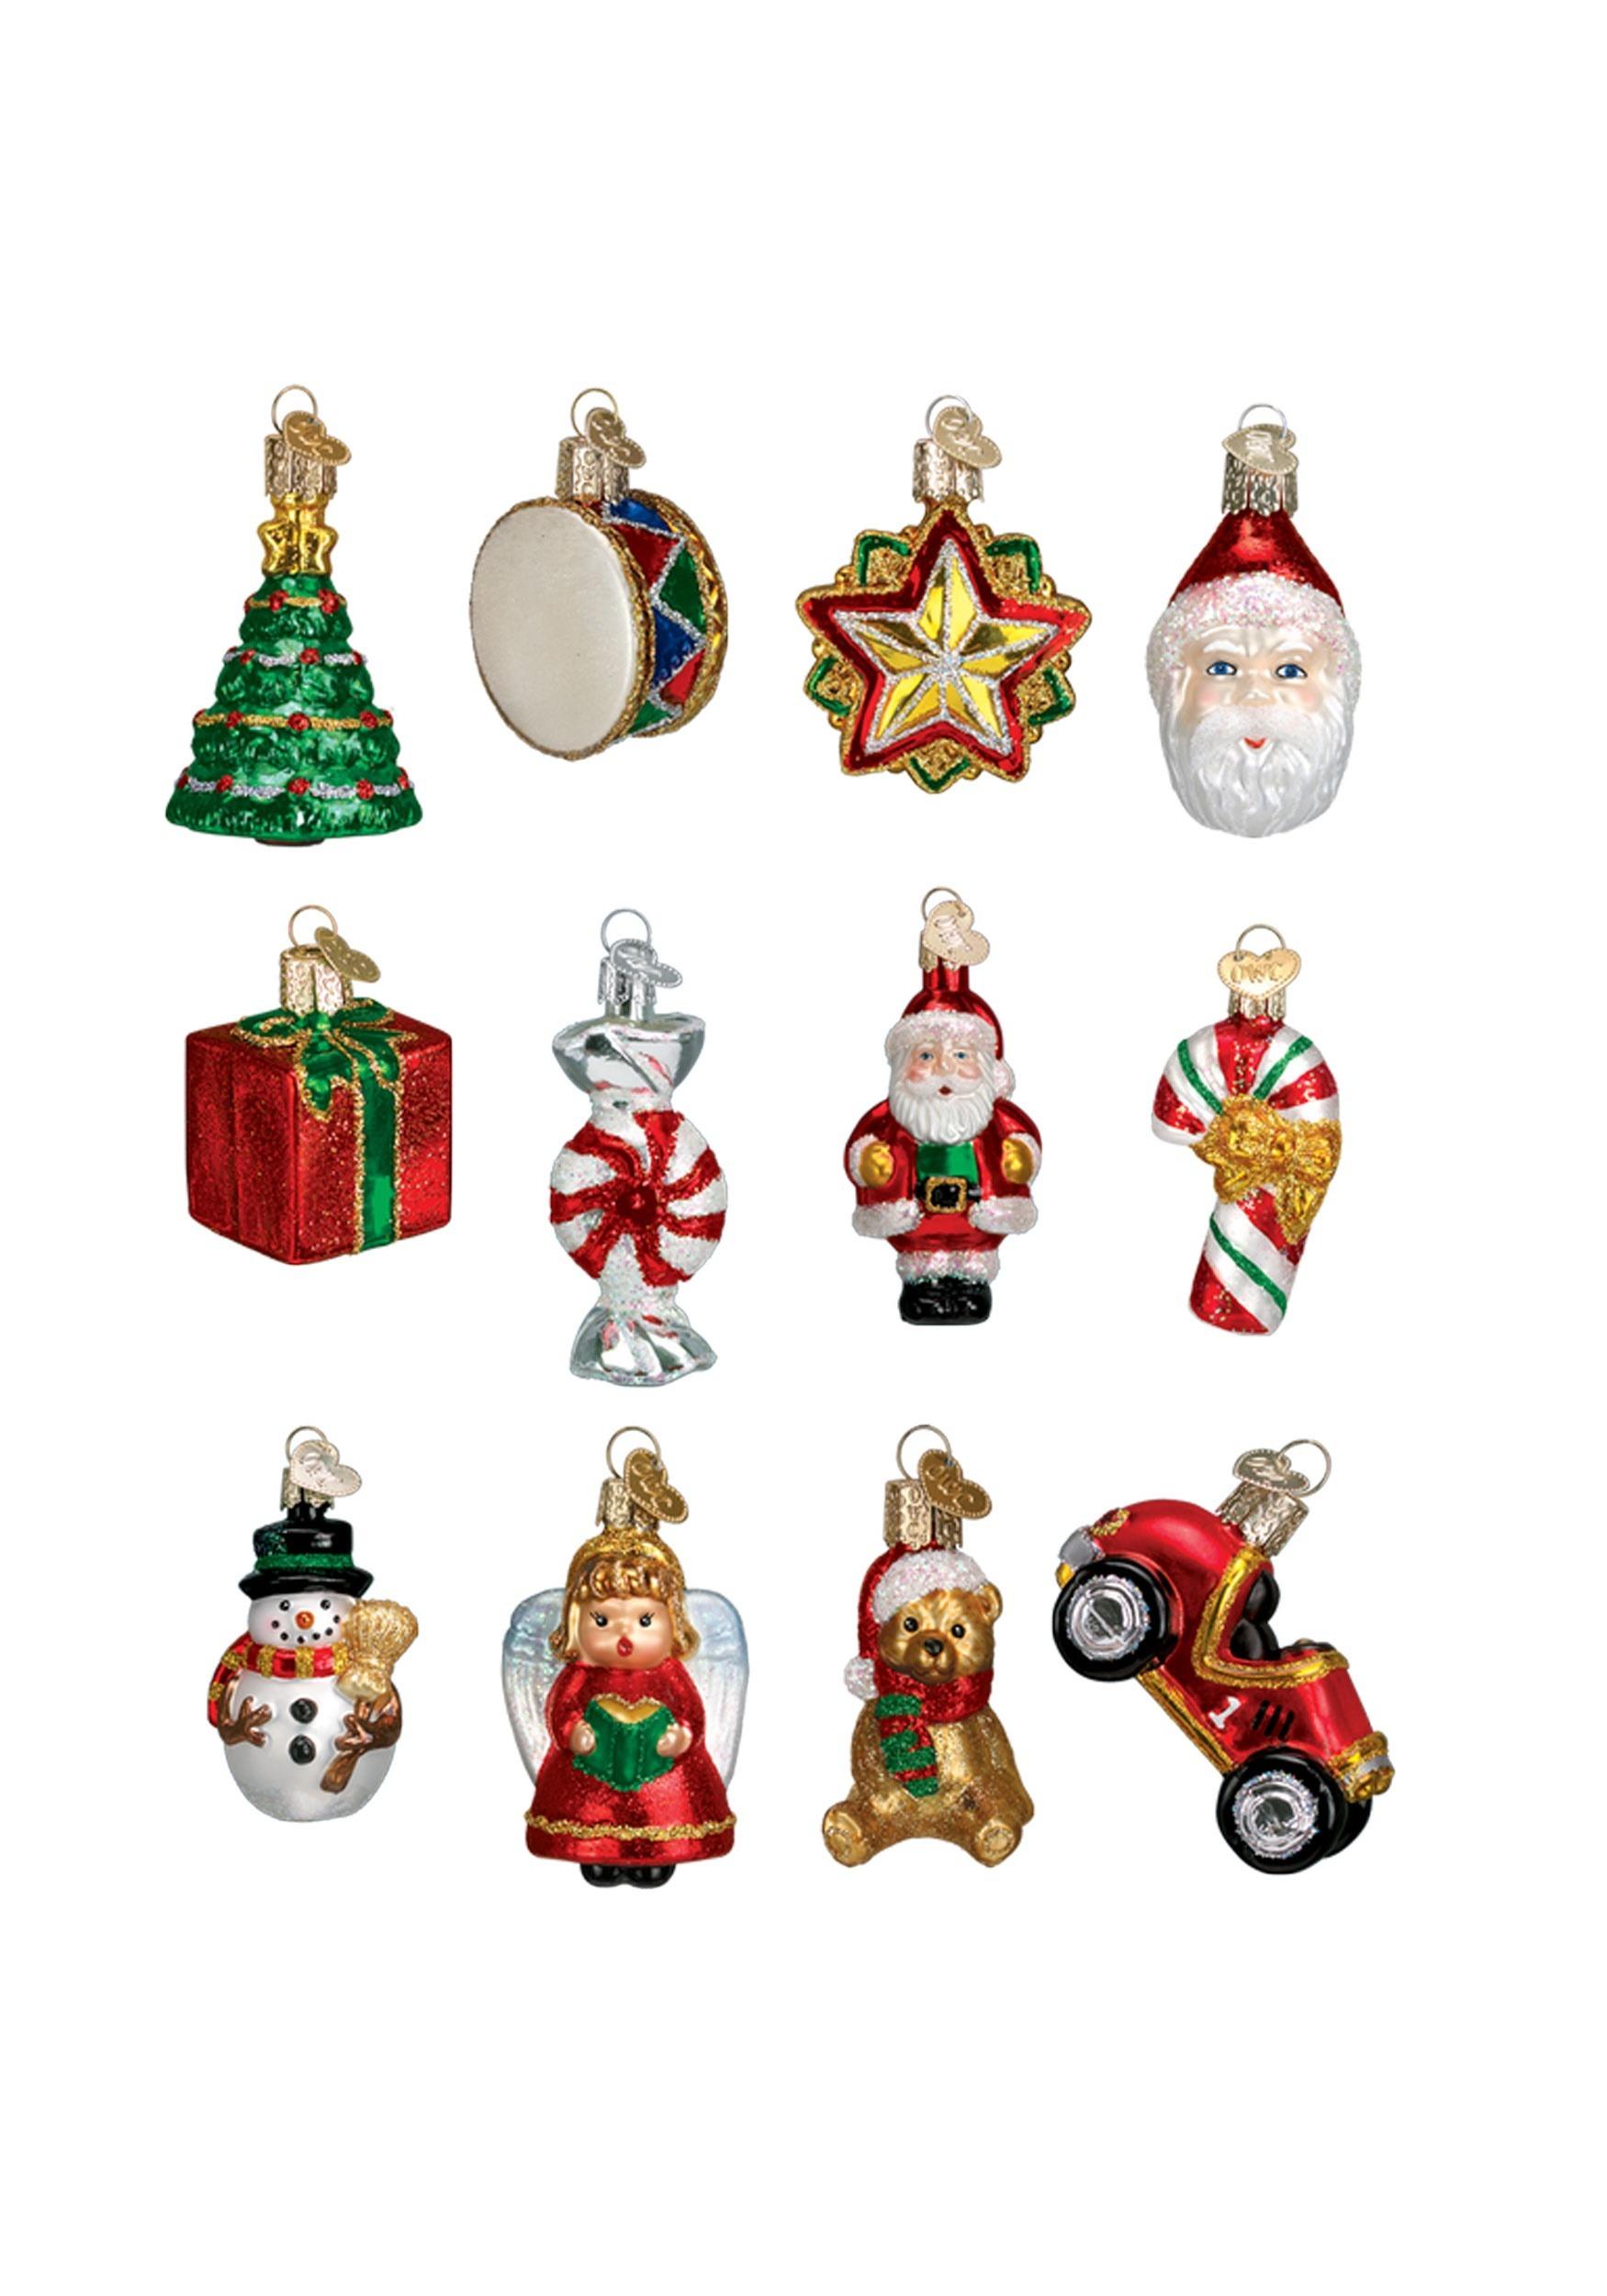 12_piece_Miniature_Christmas_Glass_Ornament_Set